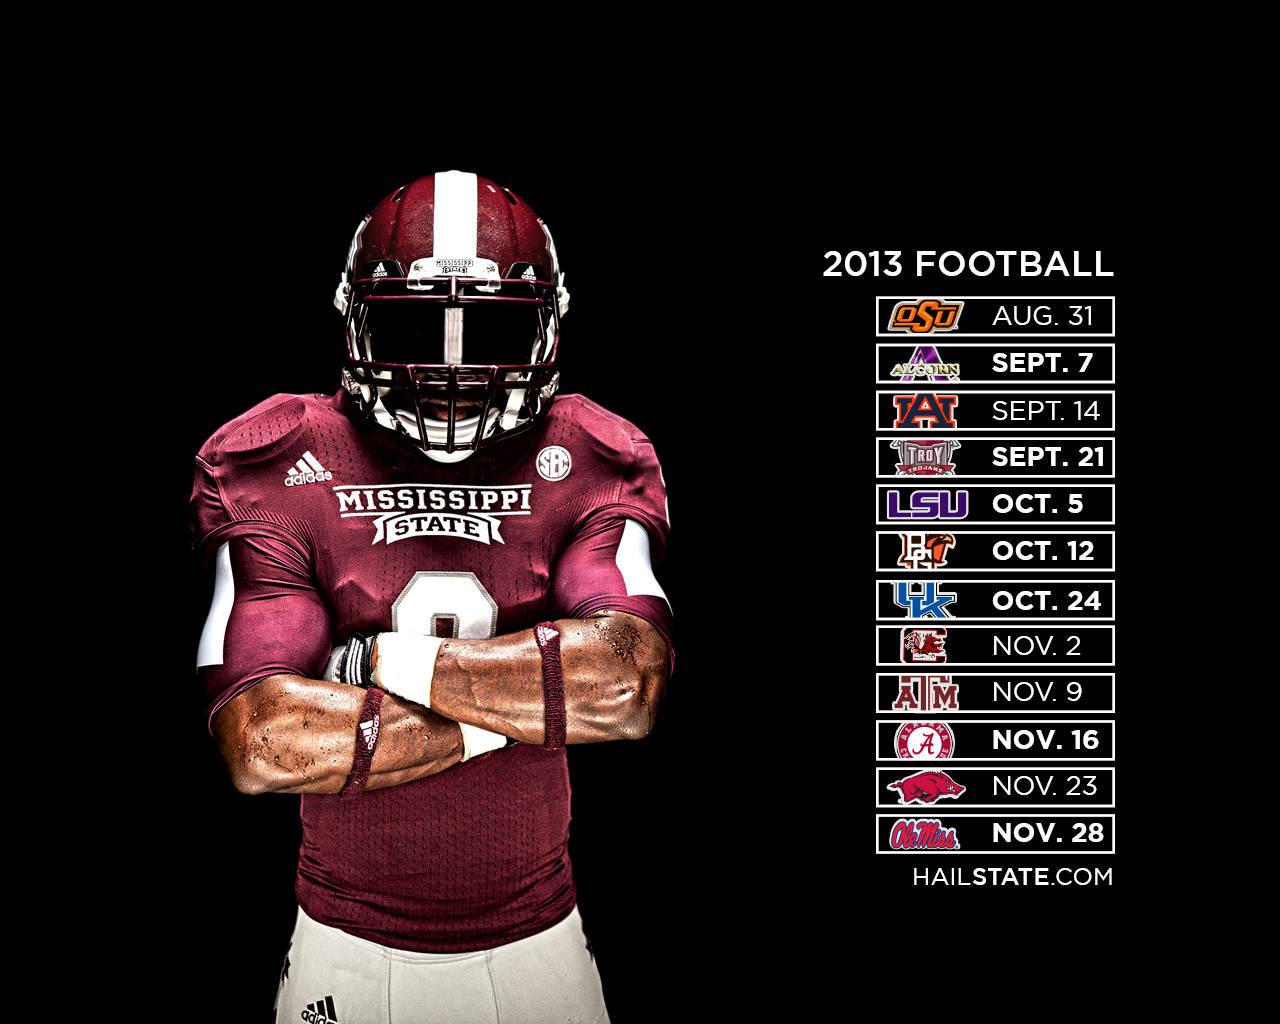 Florida State Football Wallpaper 2013 football wallpapers 1280x1024